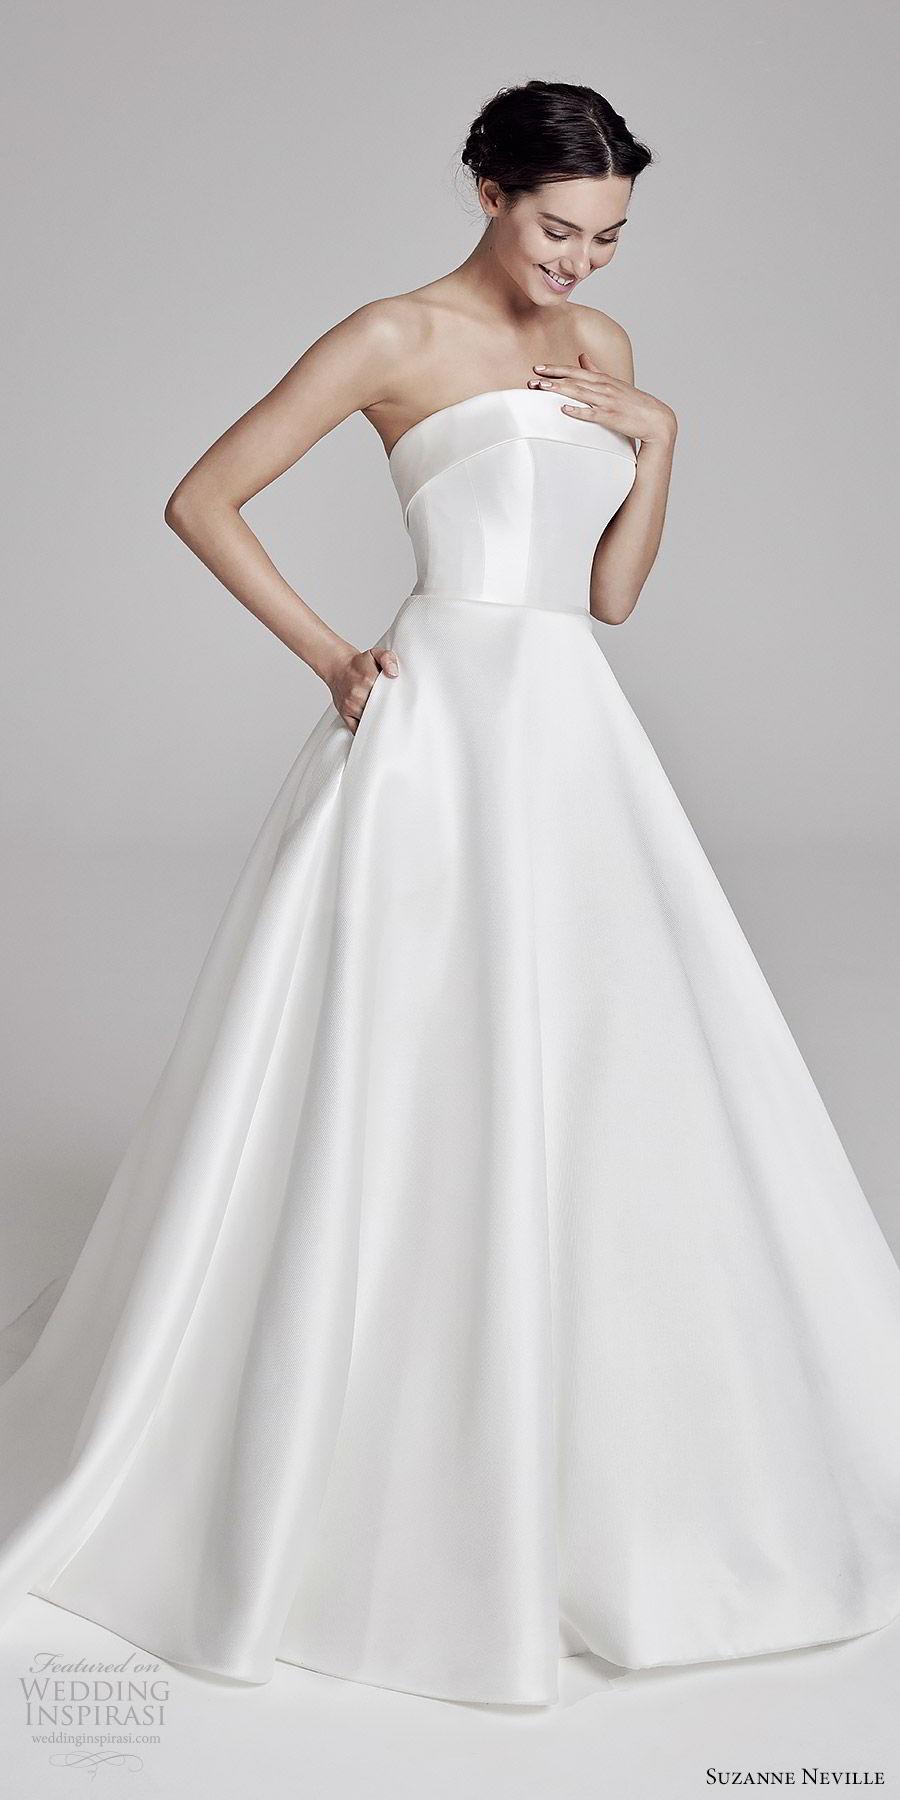 Suzanne Neville 2019 Wedding Dresses | Wedding Inspirasi